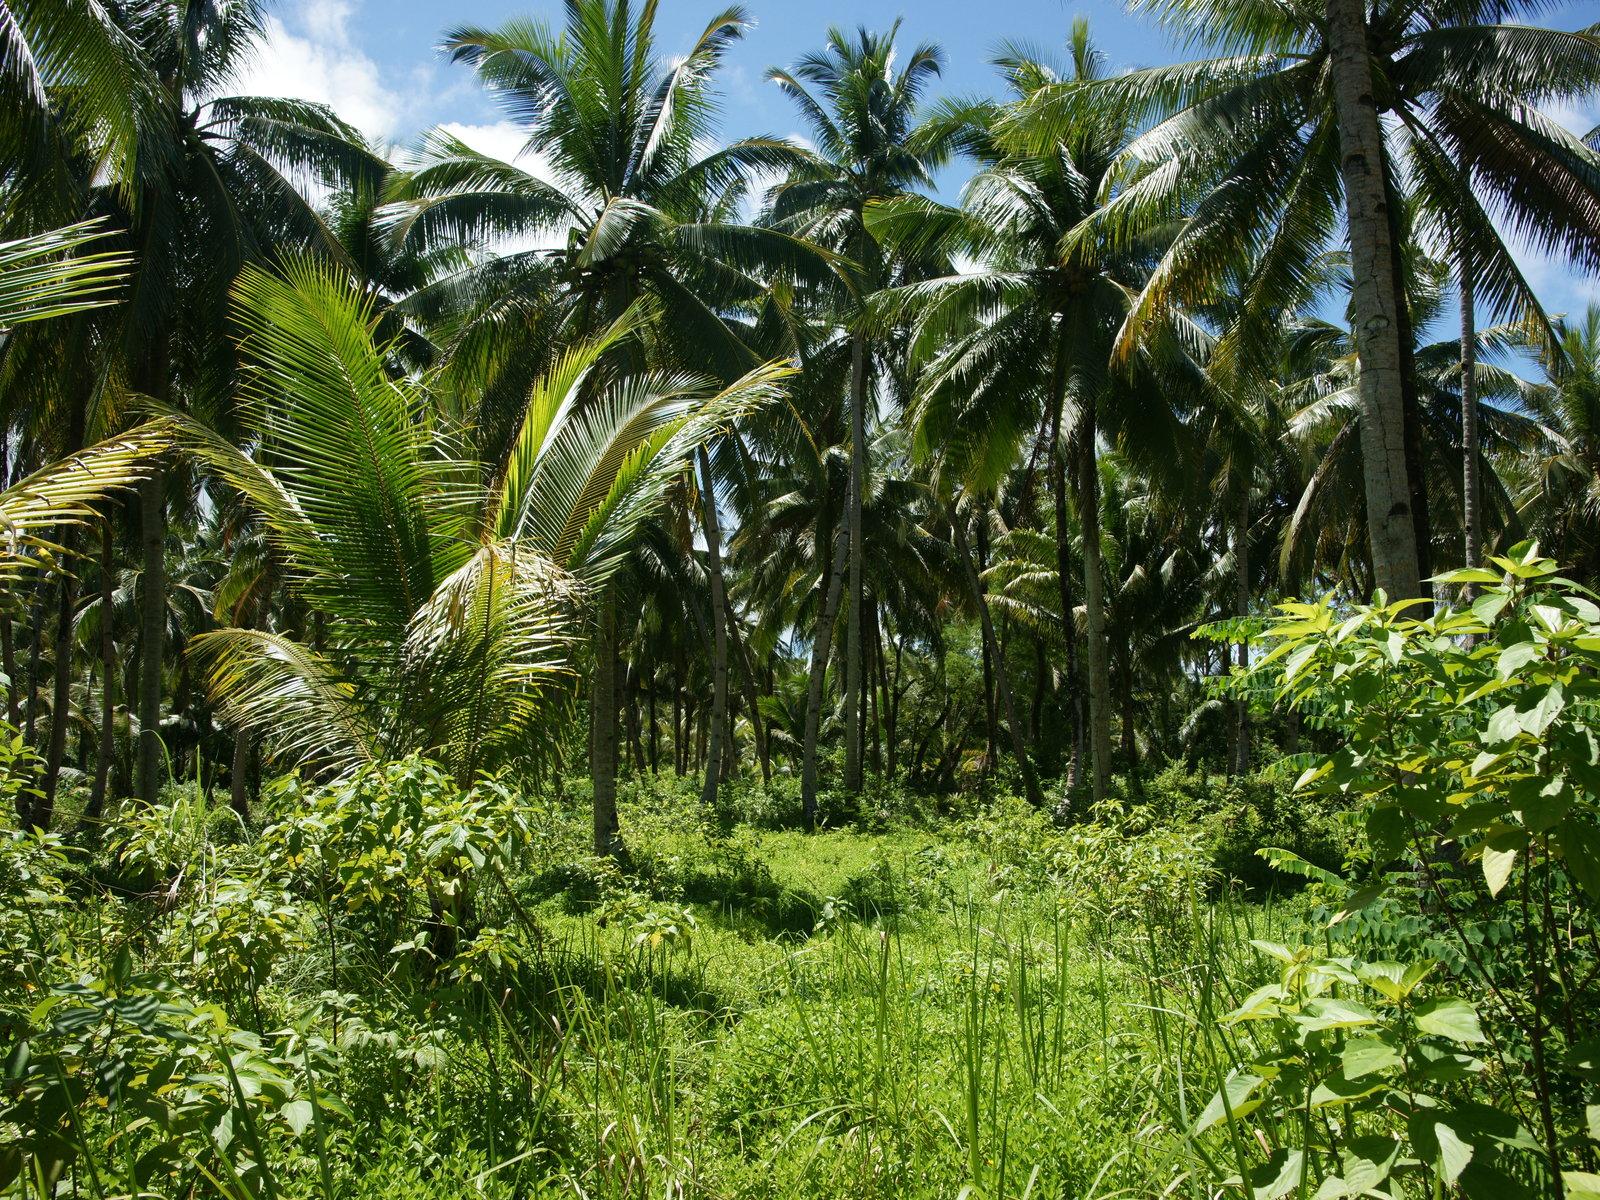 Green Lush Tropical Island